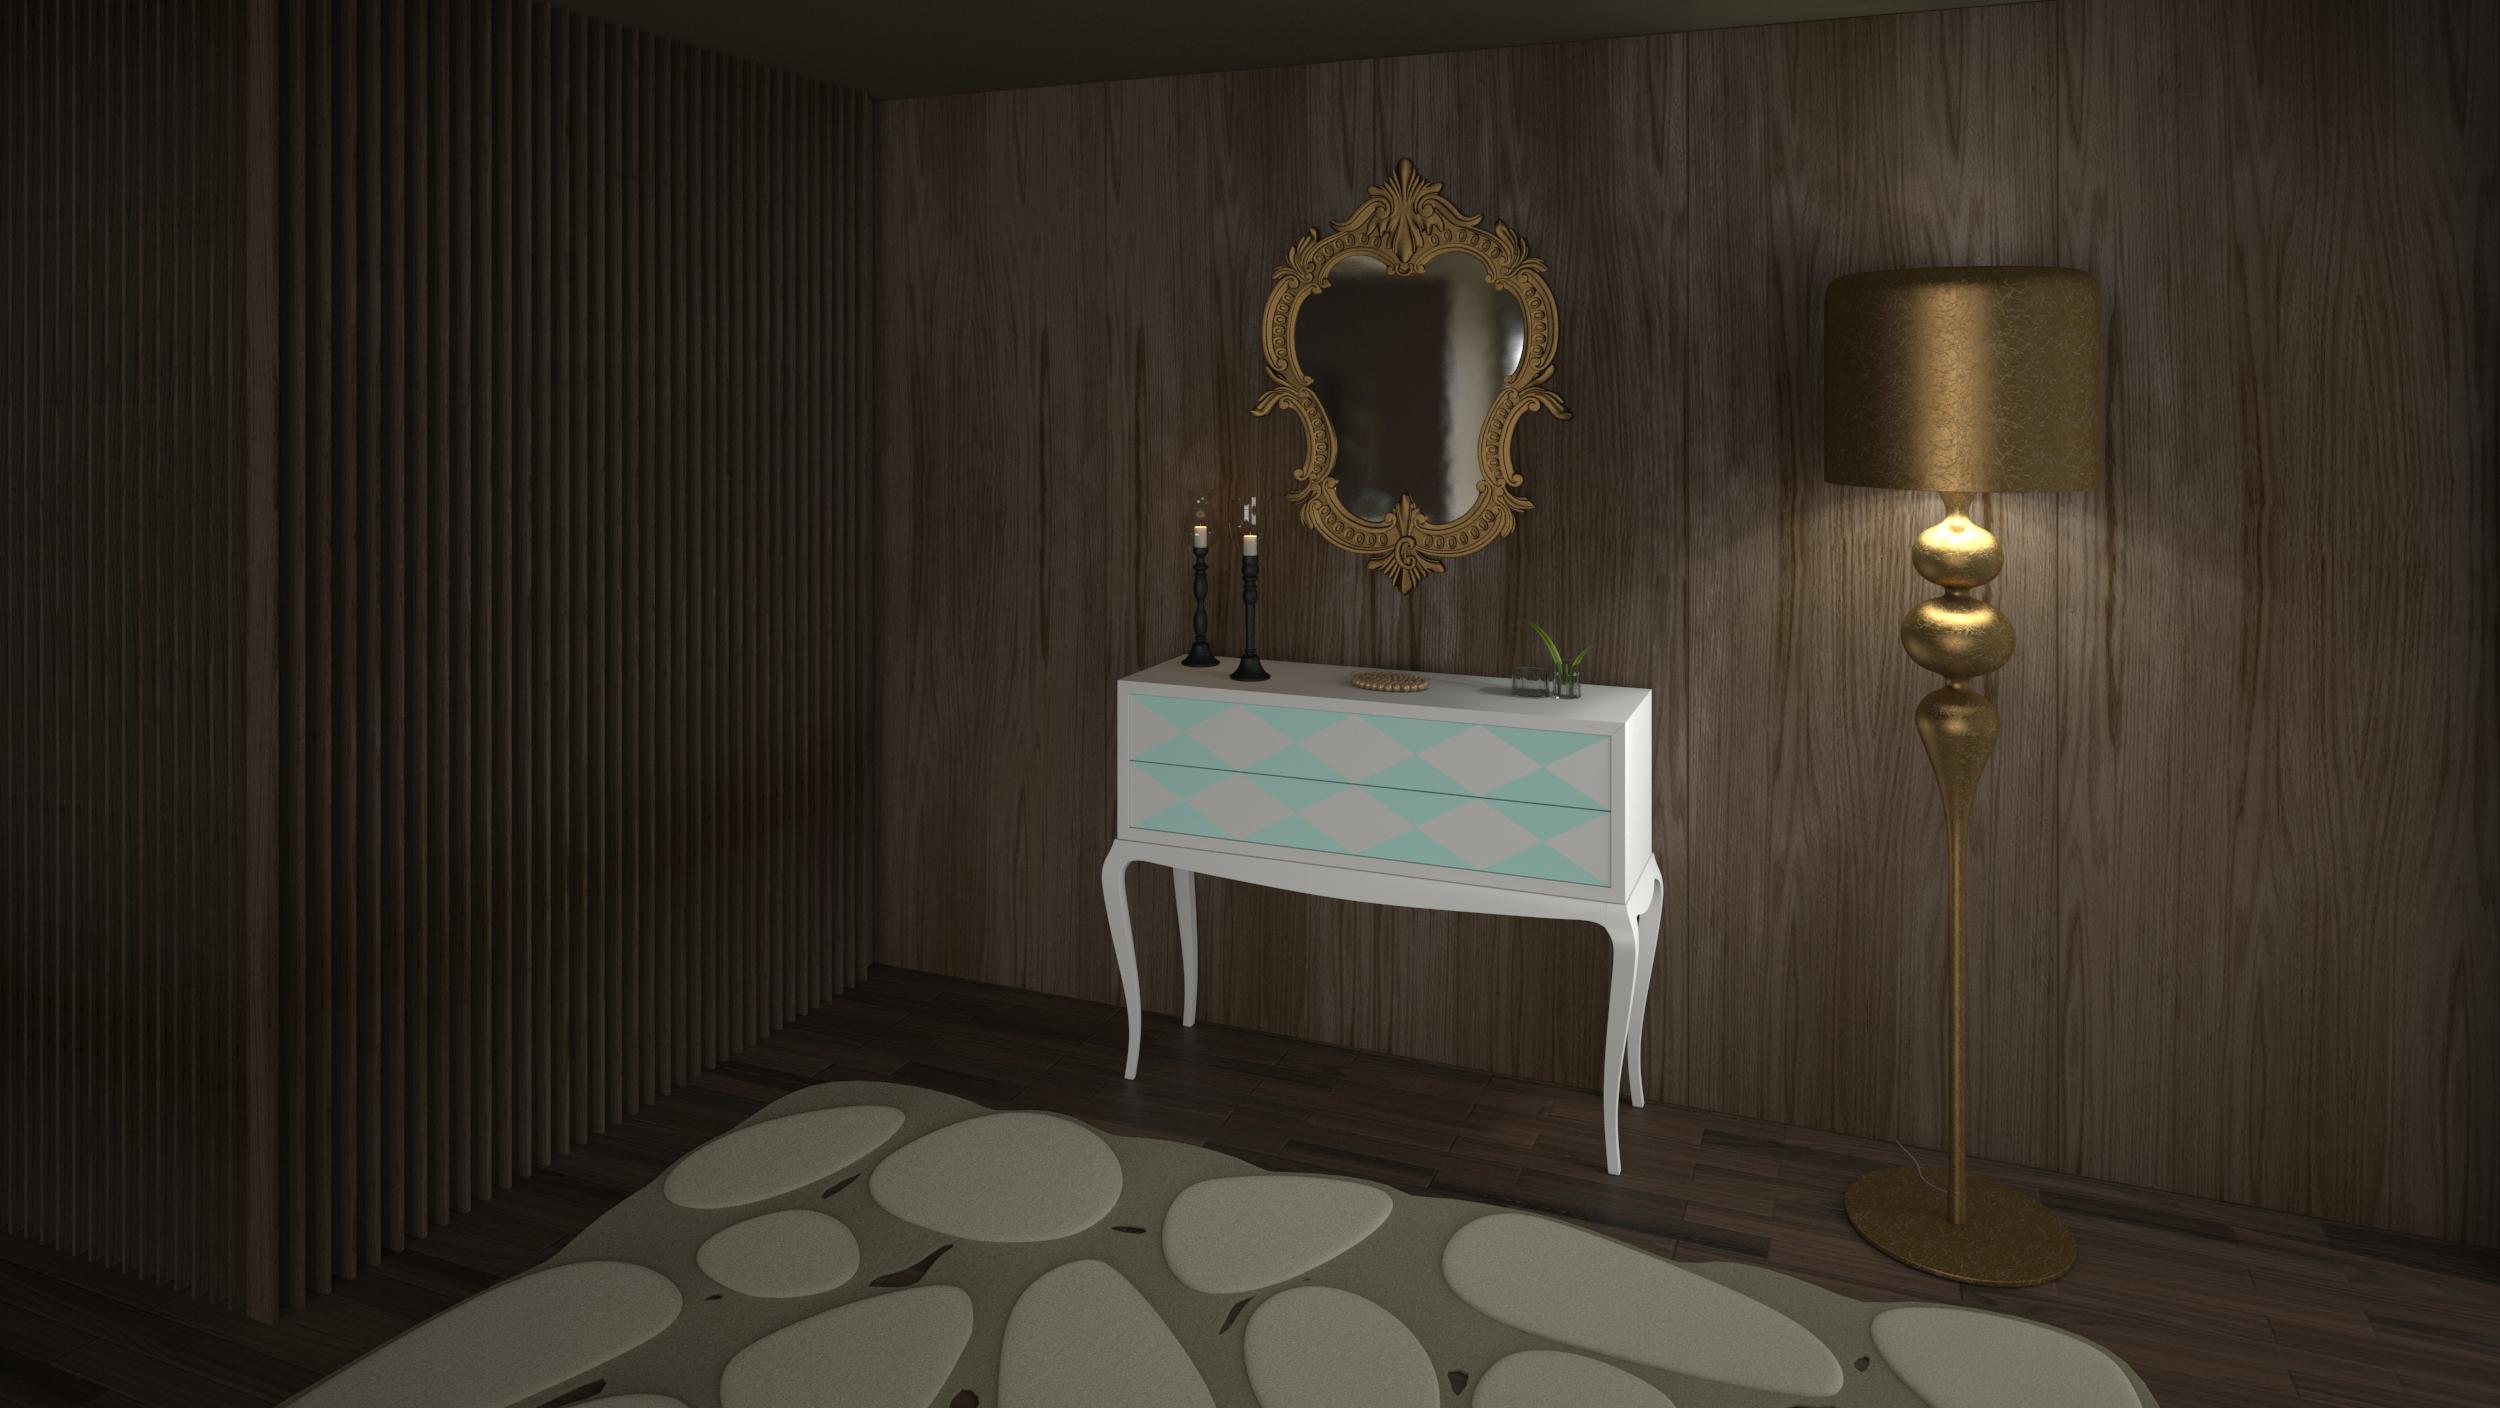 interioristas-interiorismo-decoradores-viviendas-casas-tendencias-valencia-4